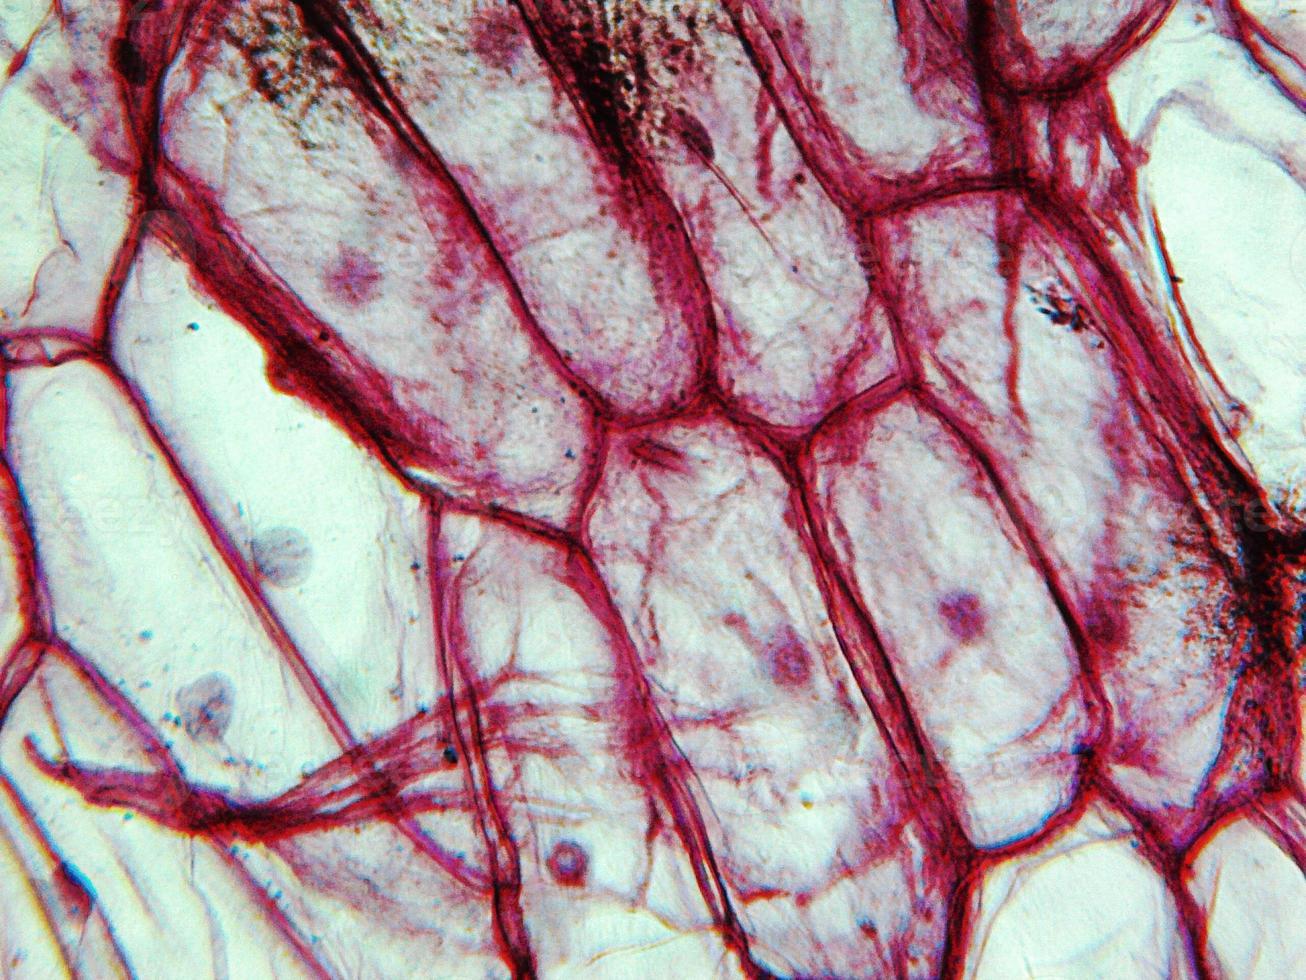 lök epidermus mikrograf foto